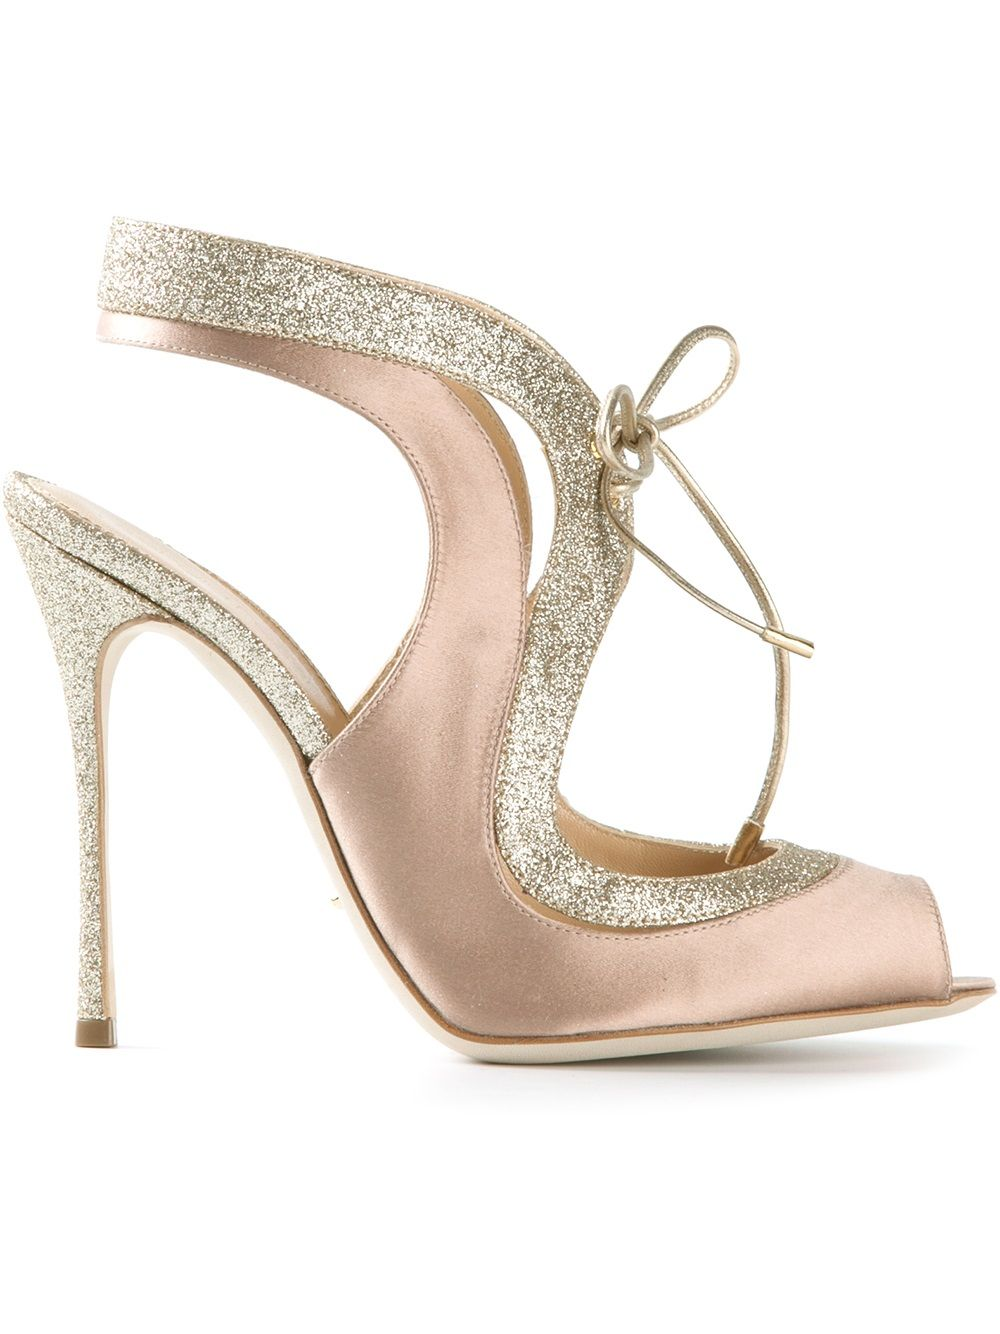 New Womens Bling Rhinestone Gladiator Sandals Fashion Flat